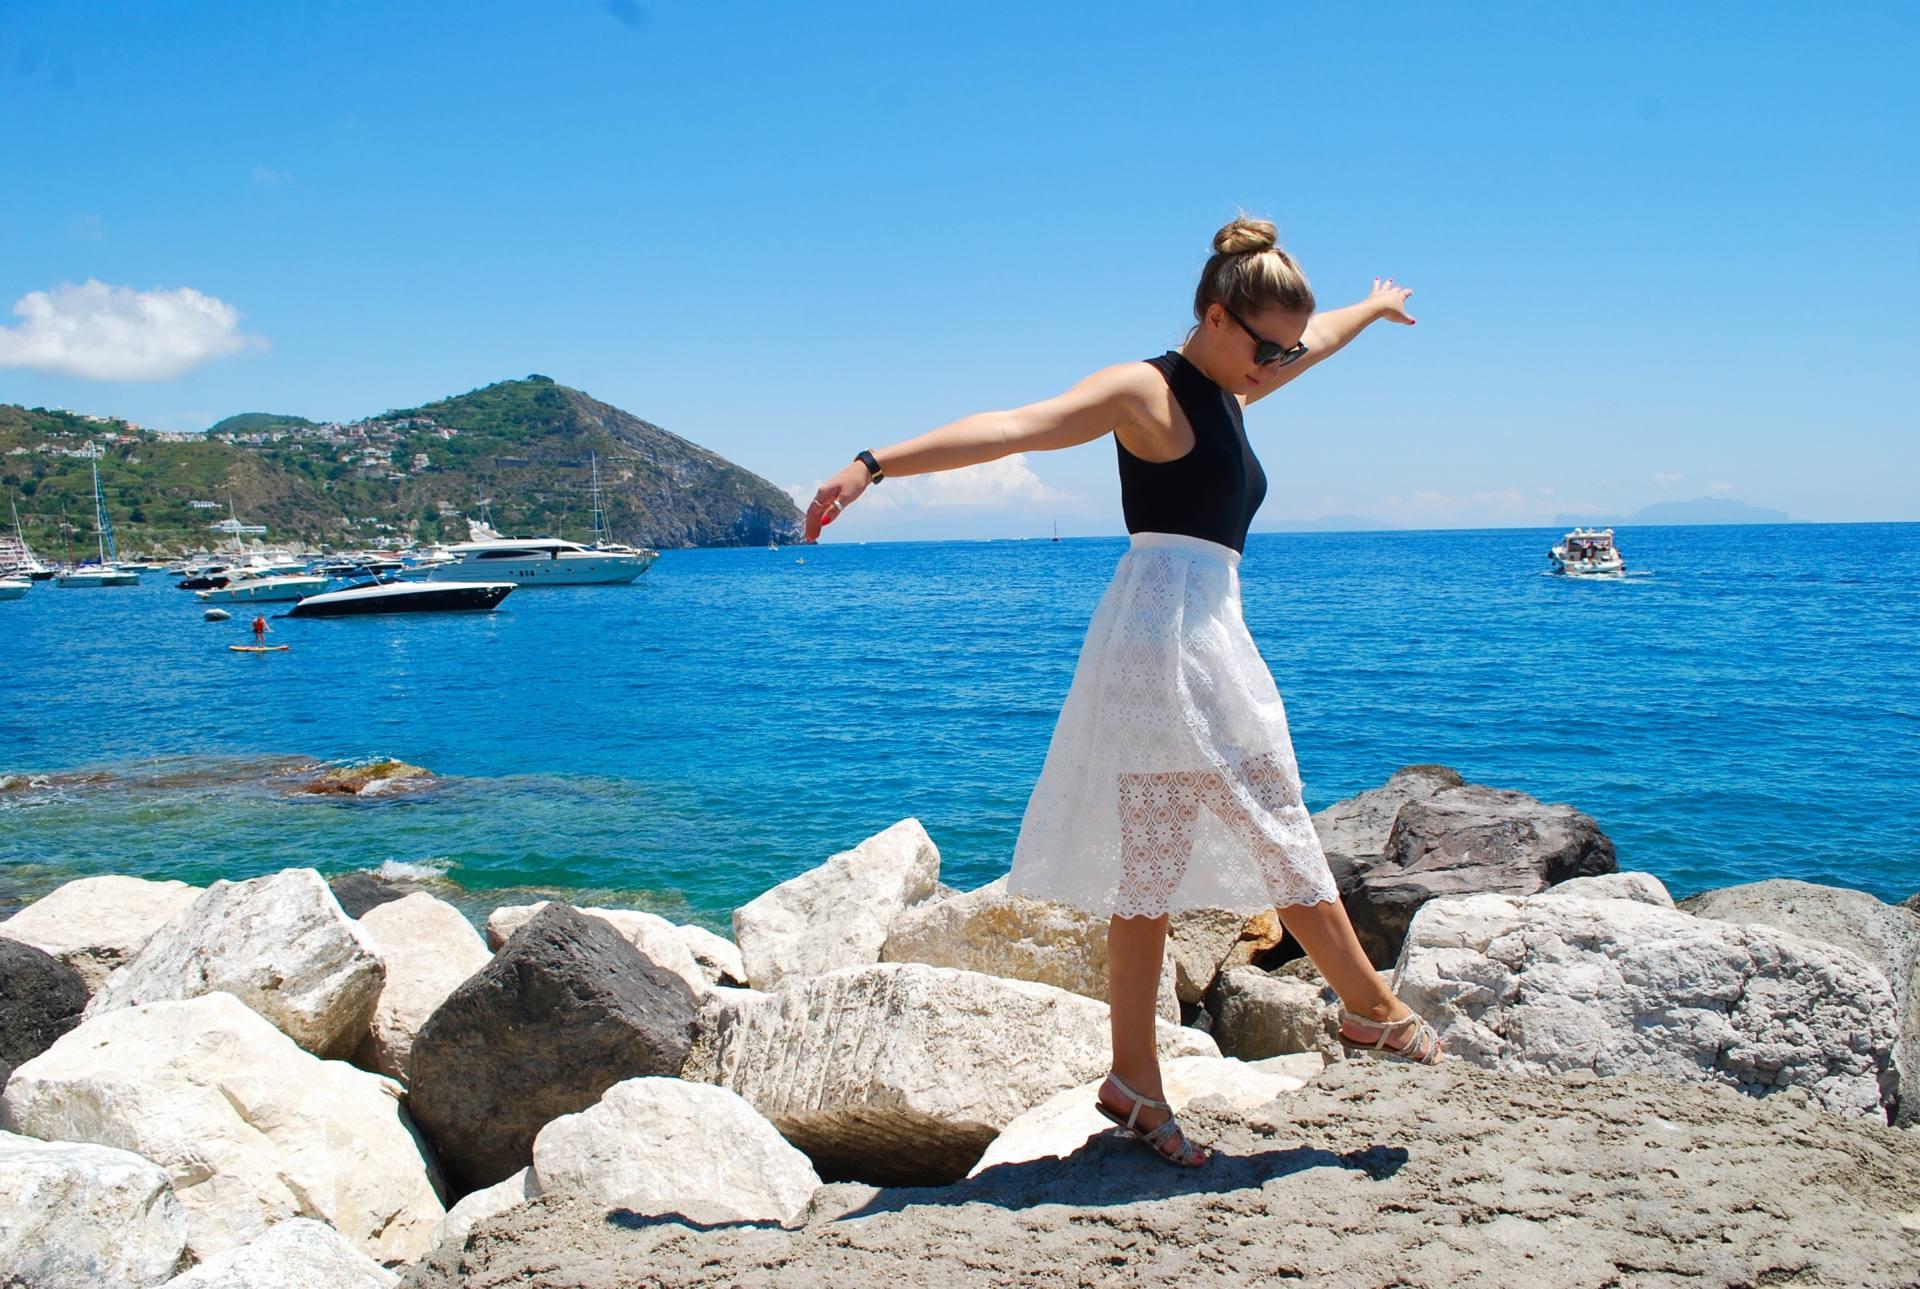 An Italian Adventure from Naples to Amalfi